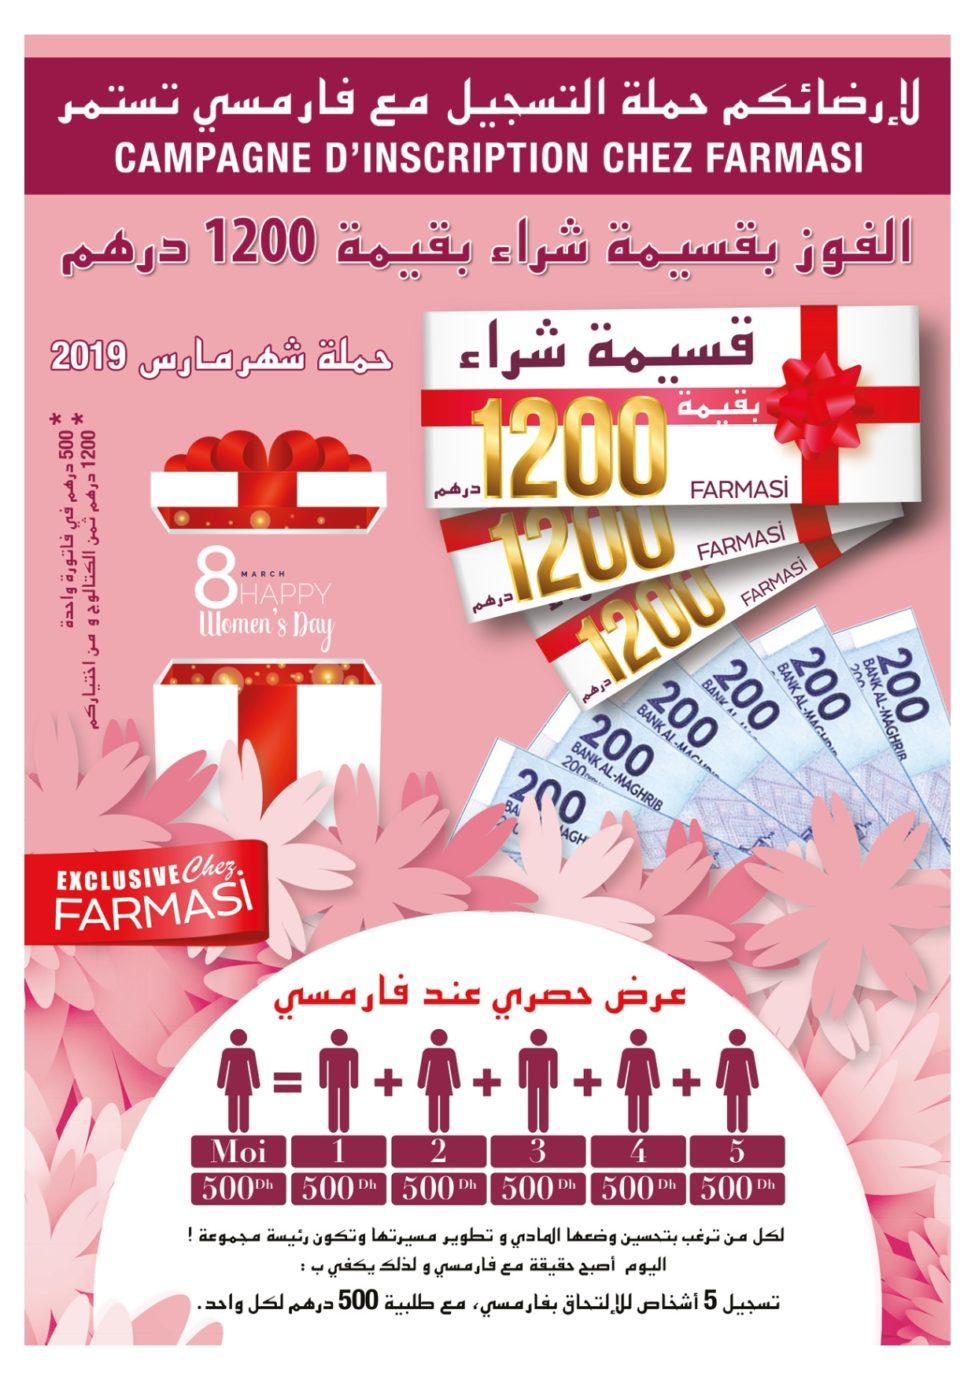 Catalogue Farmasi Maroc Spéciale Journée de la femme Mars 2019